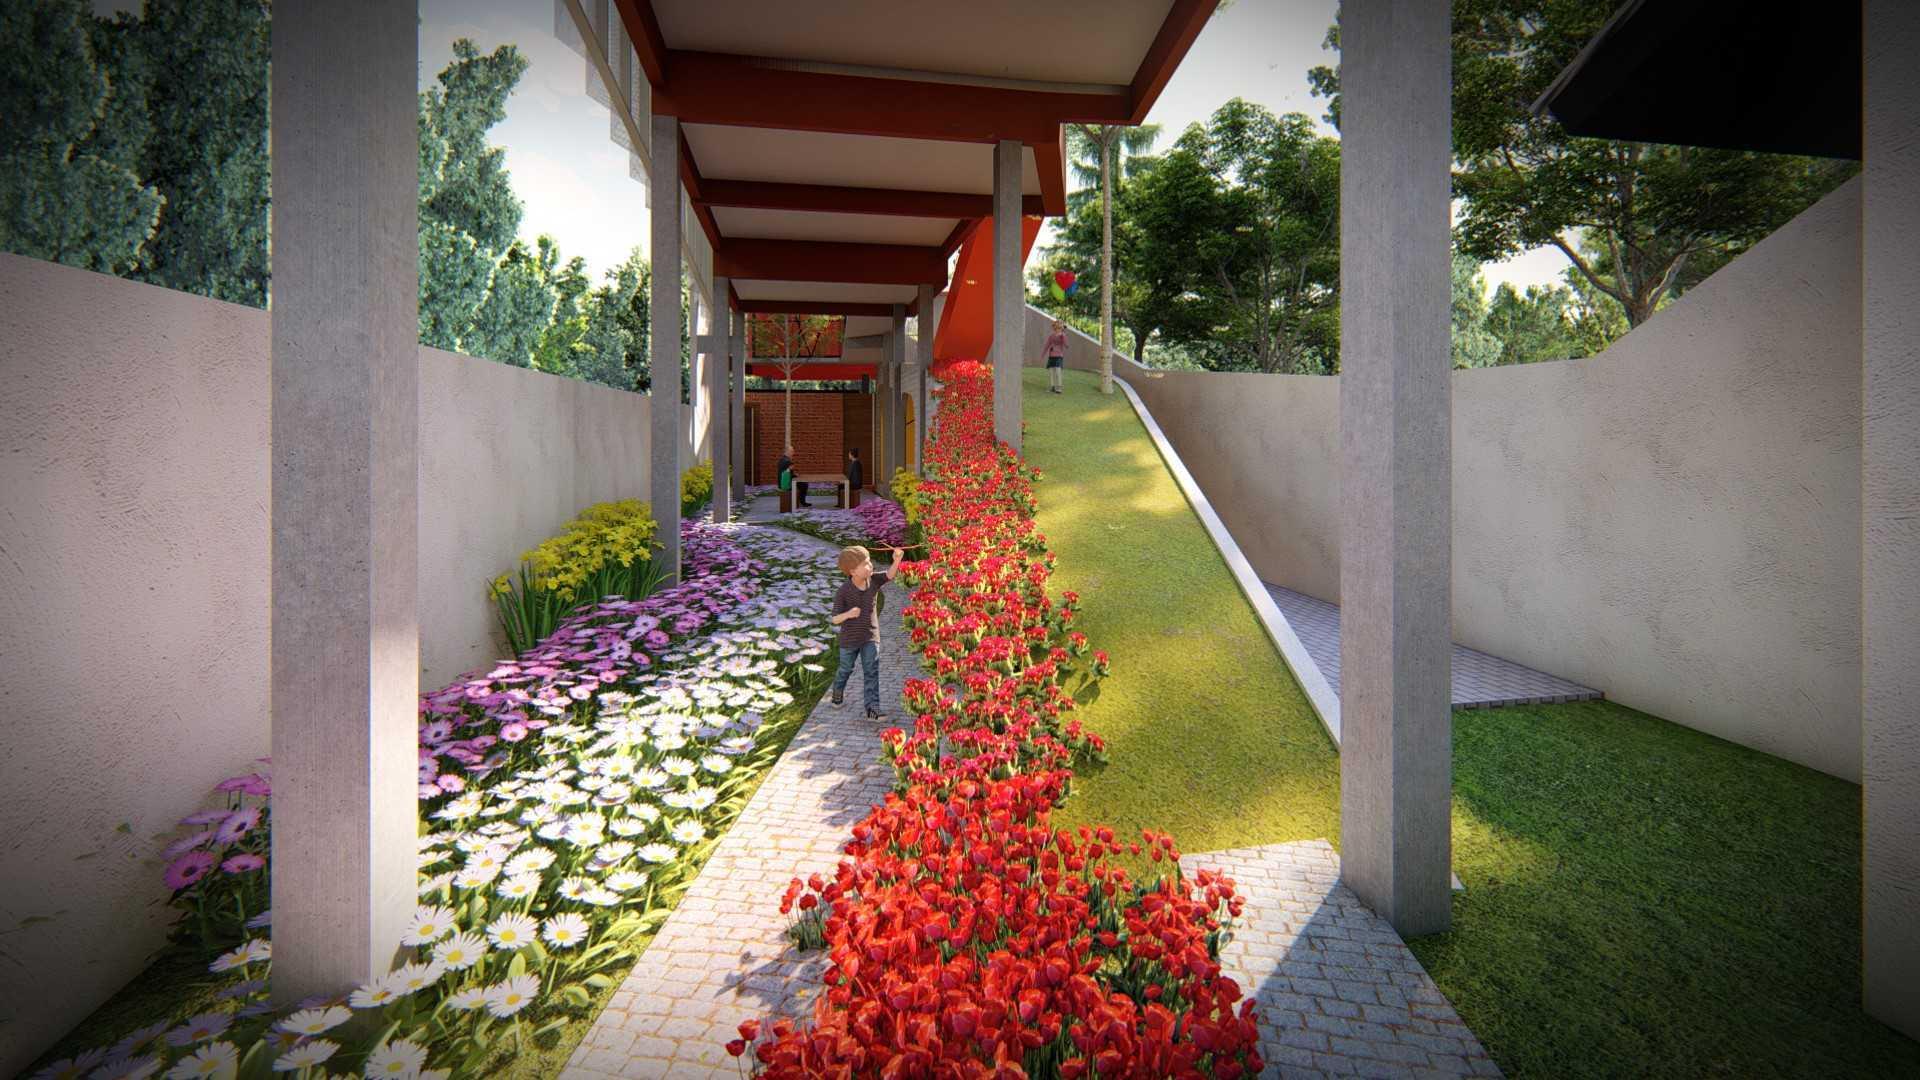 Slight Architect House Sumore Kota Manado, Sulawesi Utara, Indonesia Kota Manado, Sulawesi Utara, Indonesia Slight-Architect-House-Sumore  122816